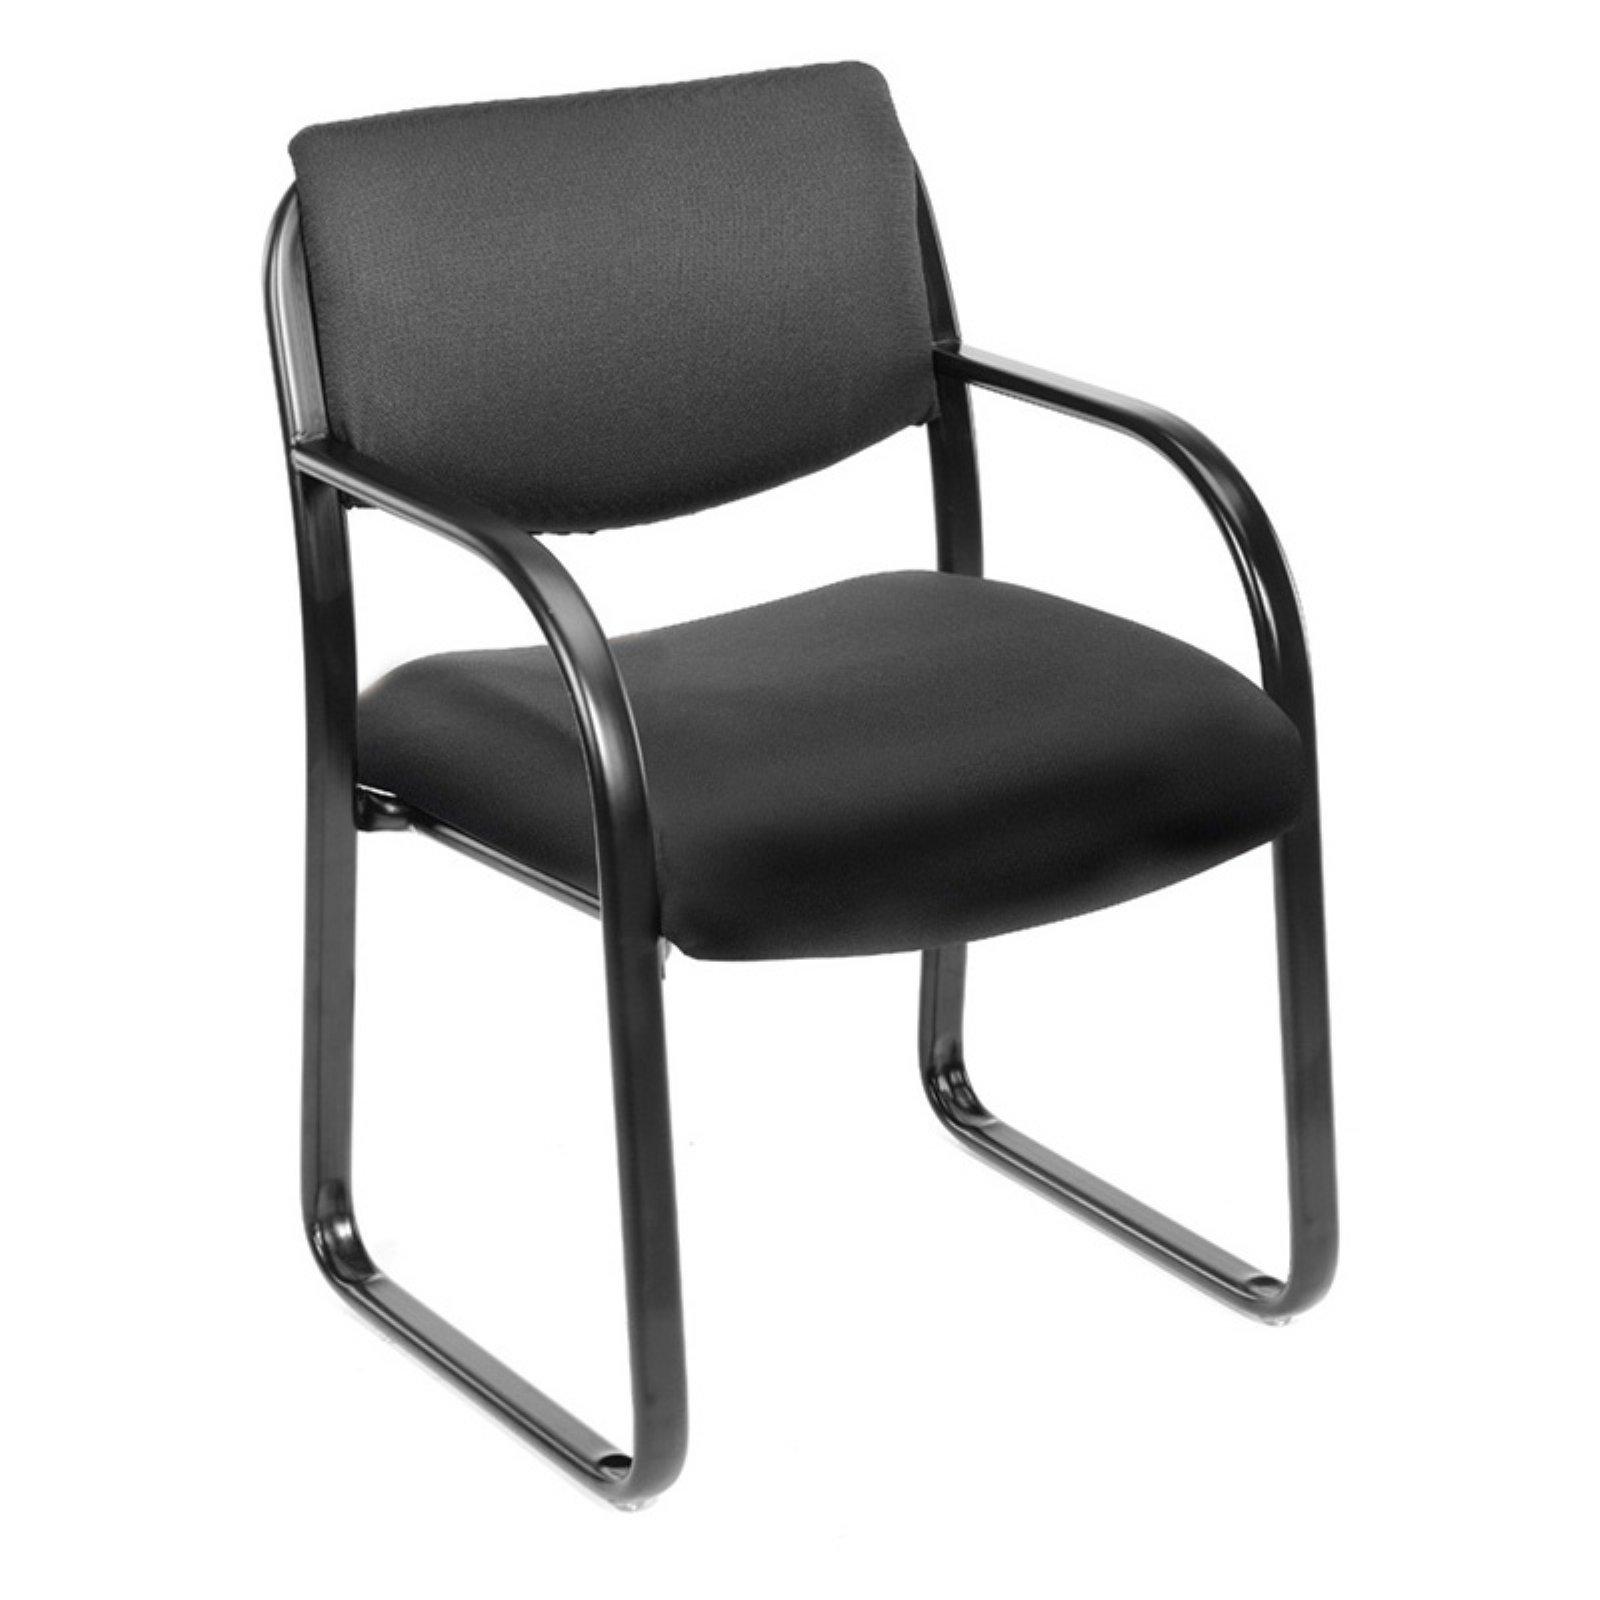 Boss Steel Frame Guest Chair - B9521 - Black